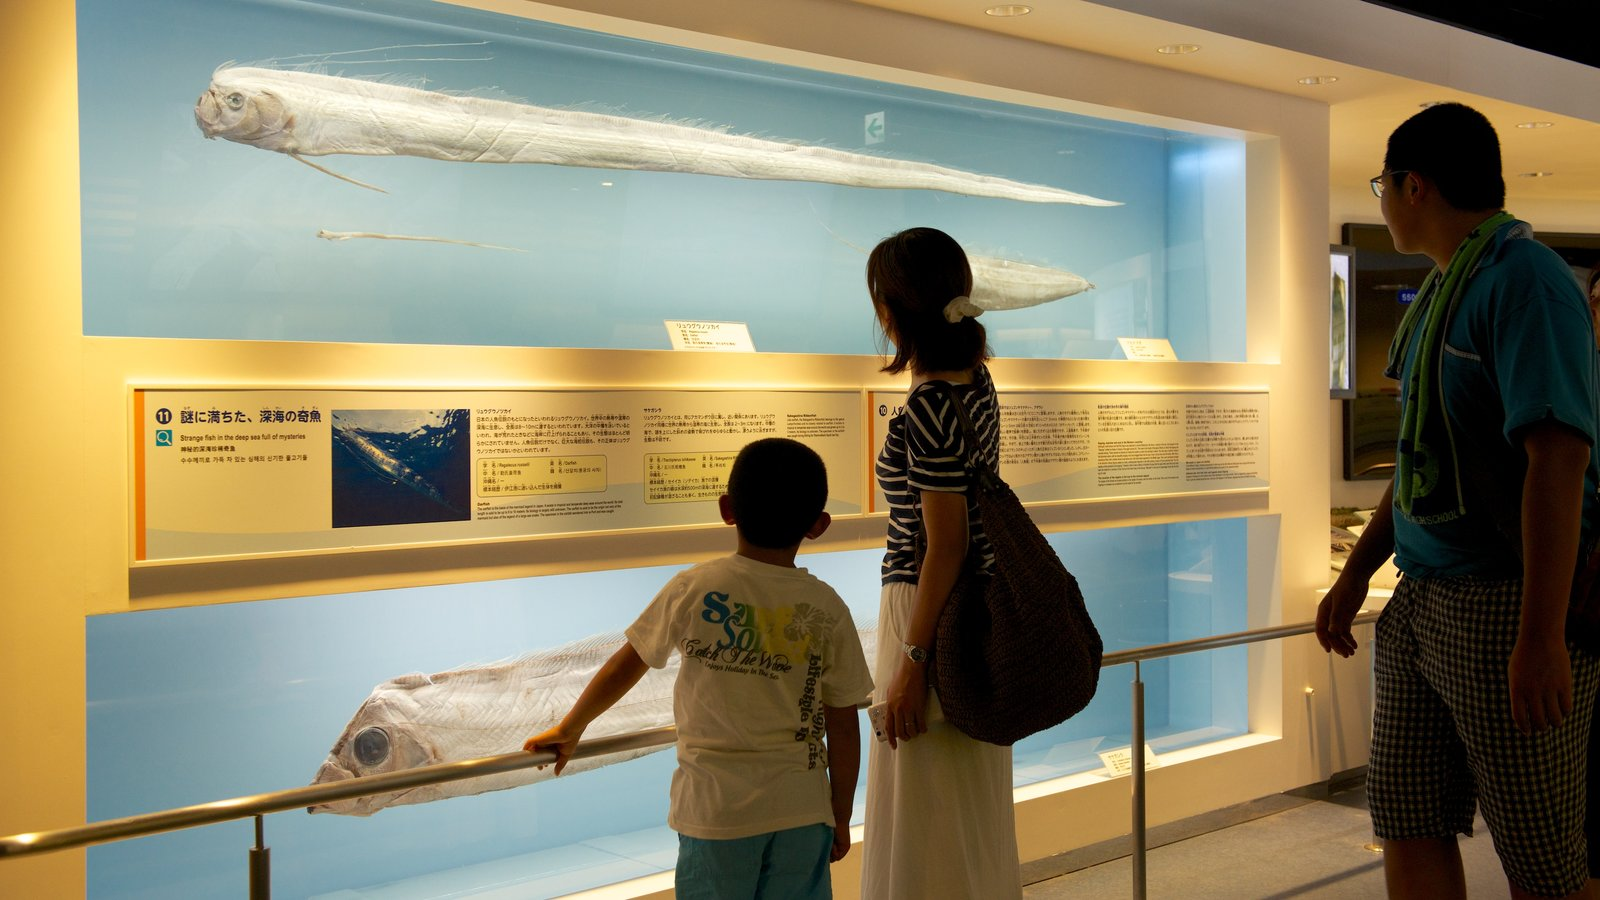 Okinawa Churaumi Aquarium showing interior views and marine life as well as a family